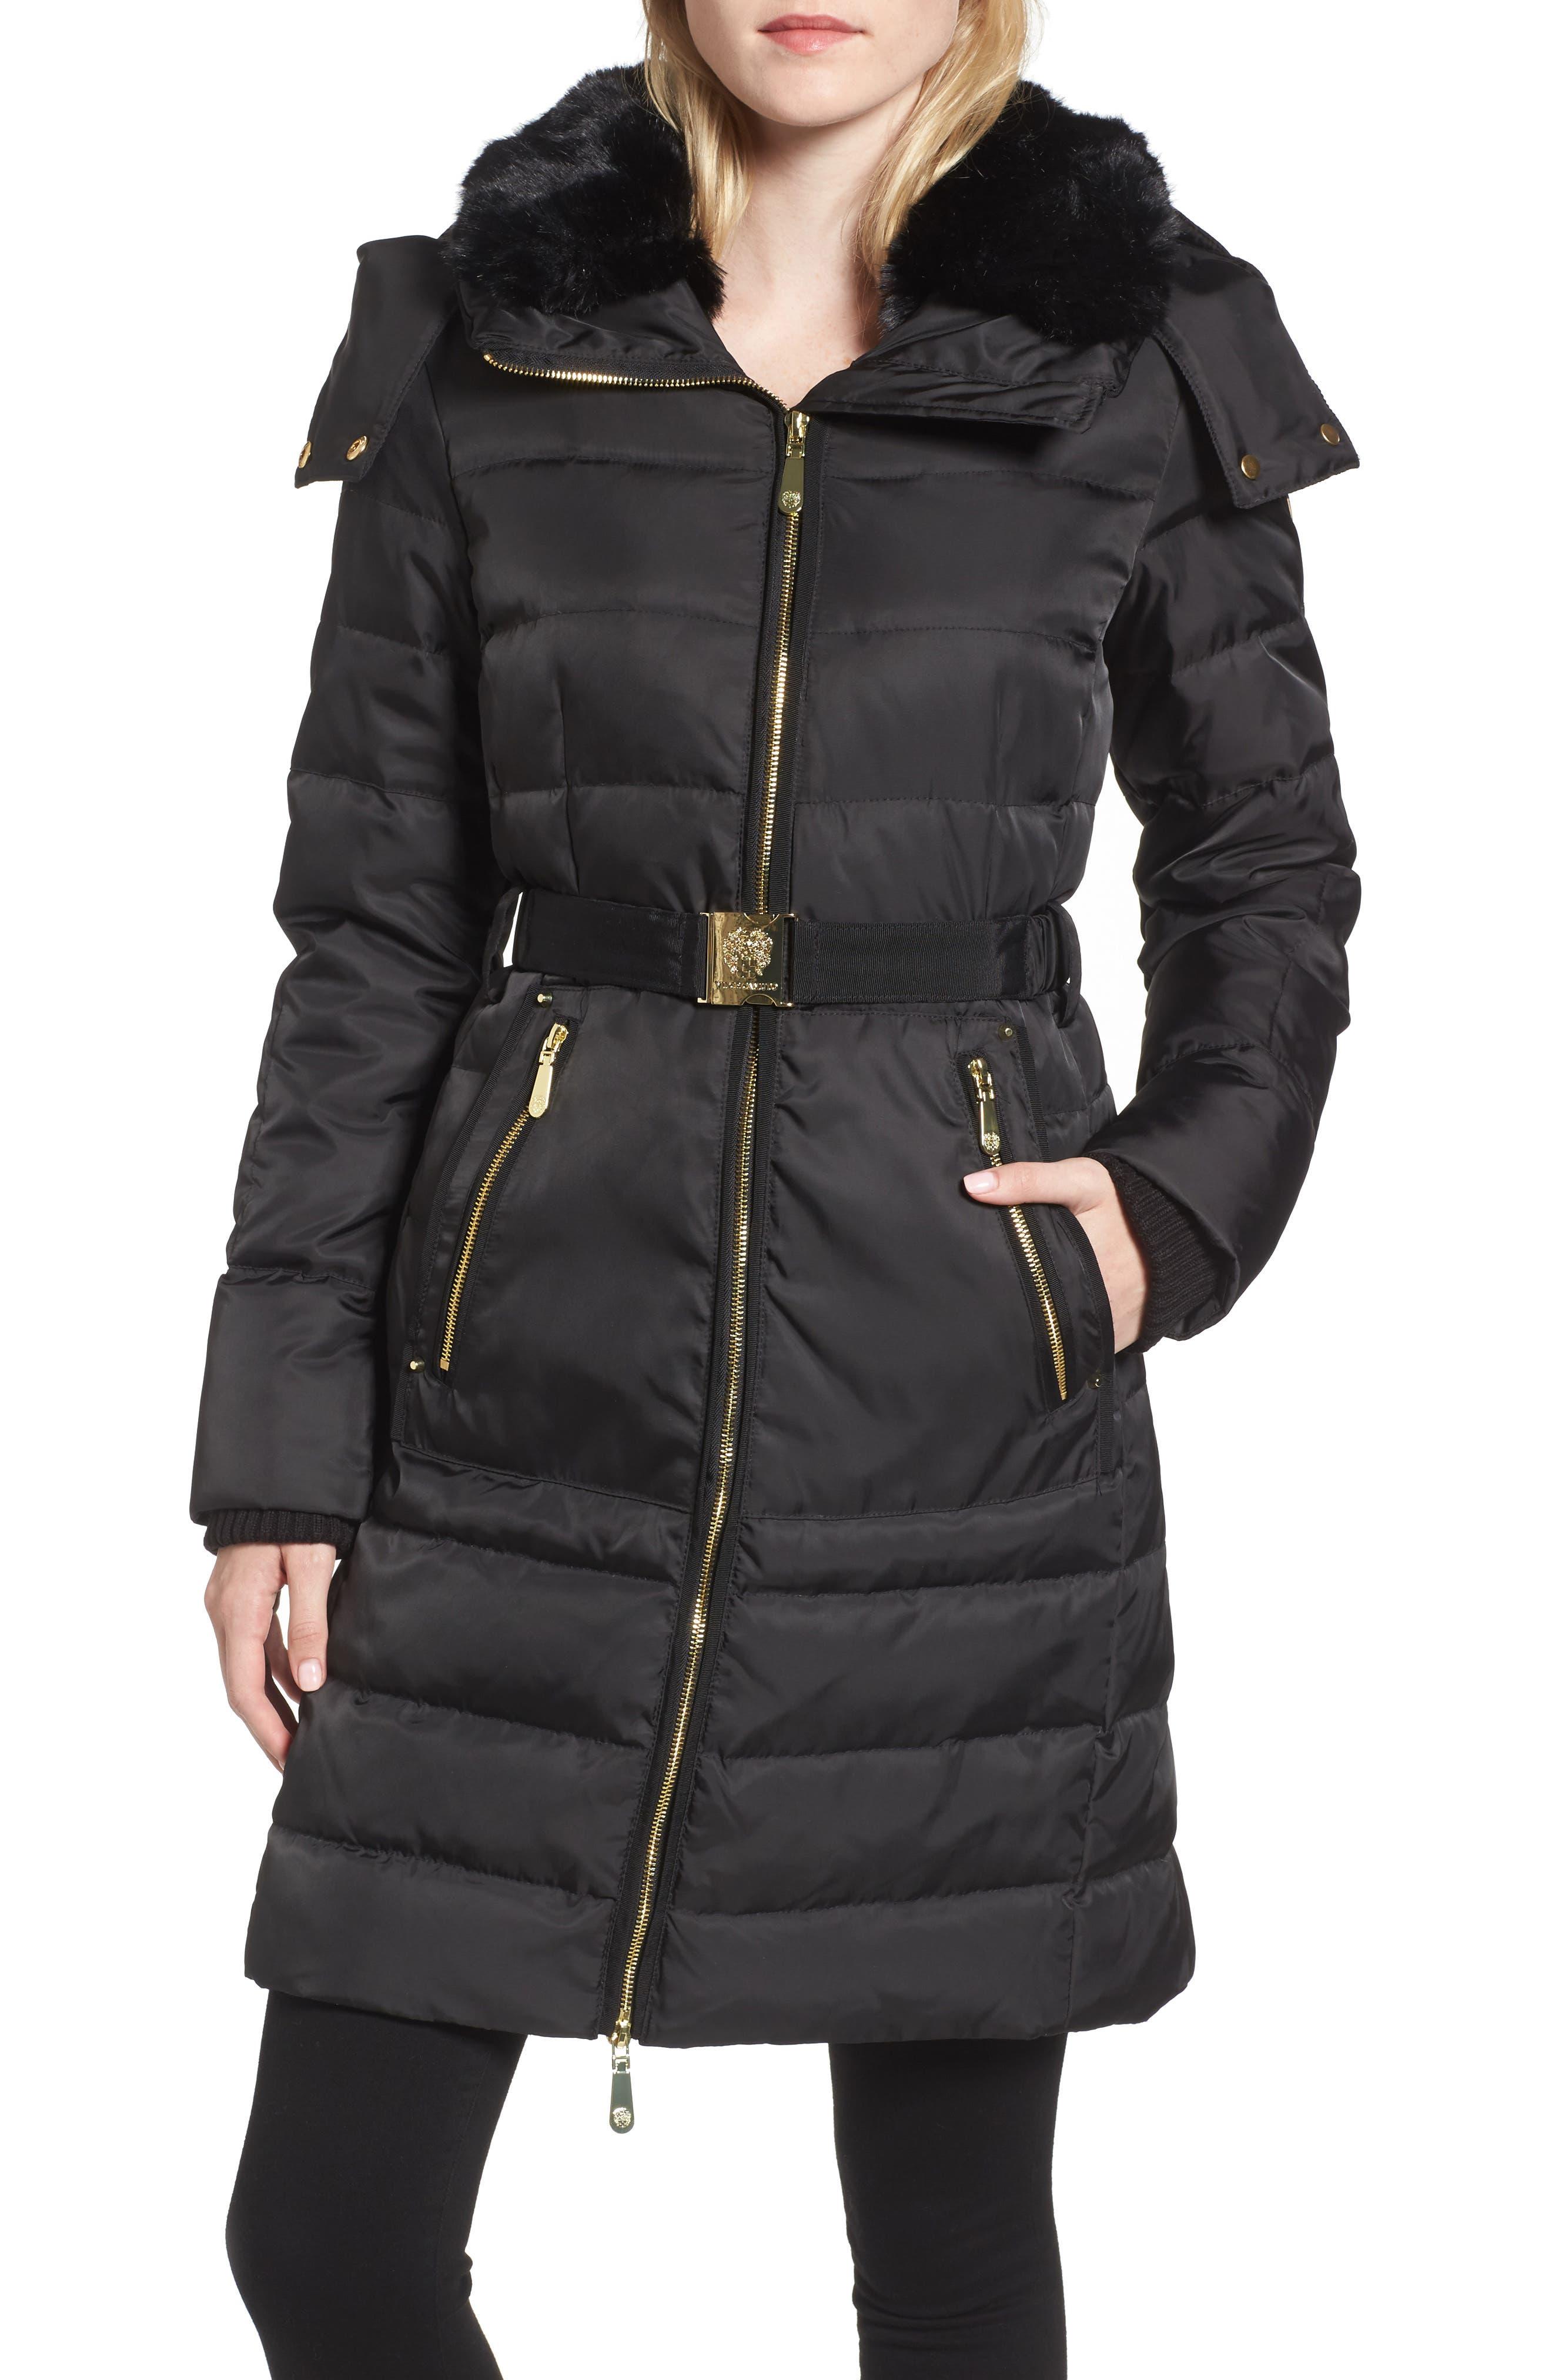 Belted Coat with Detachable Faux Fur,                             Main thumbnail 1, color,                             001